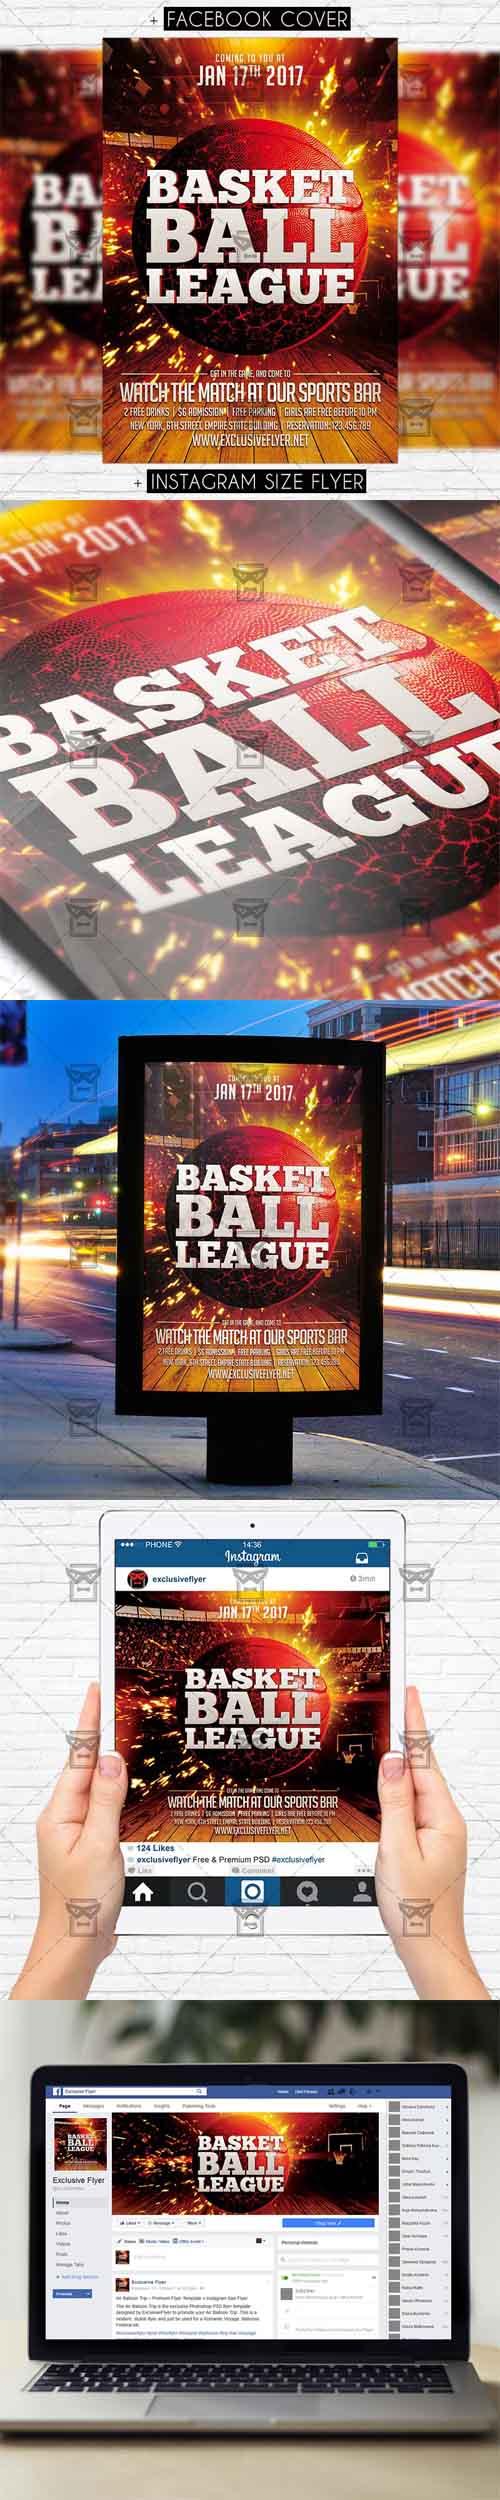 Flyer Template - Basketball League